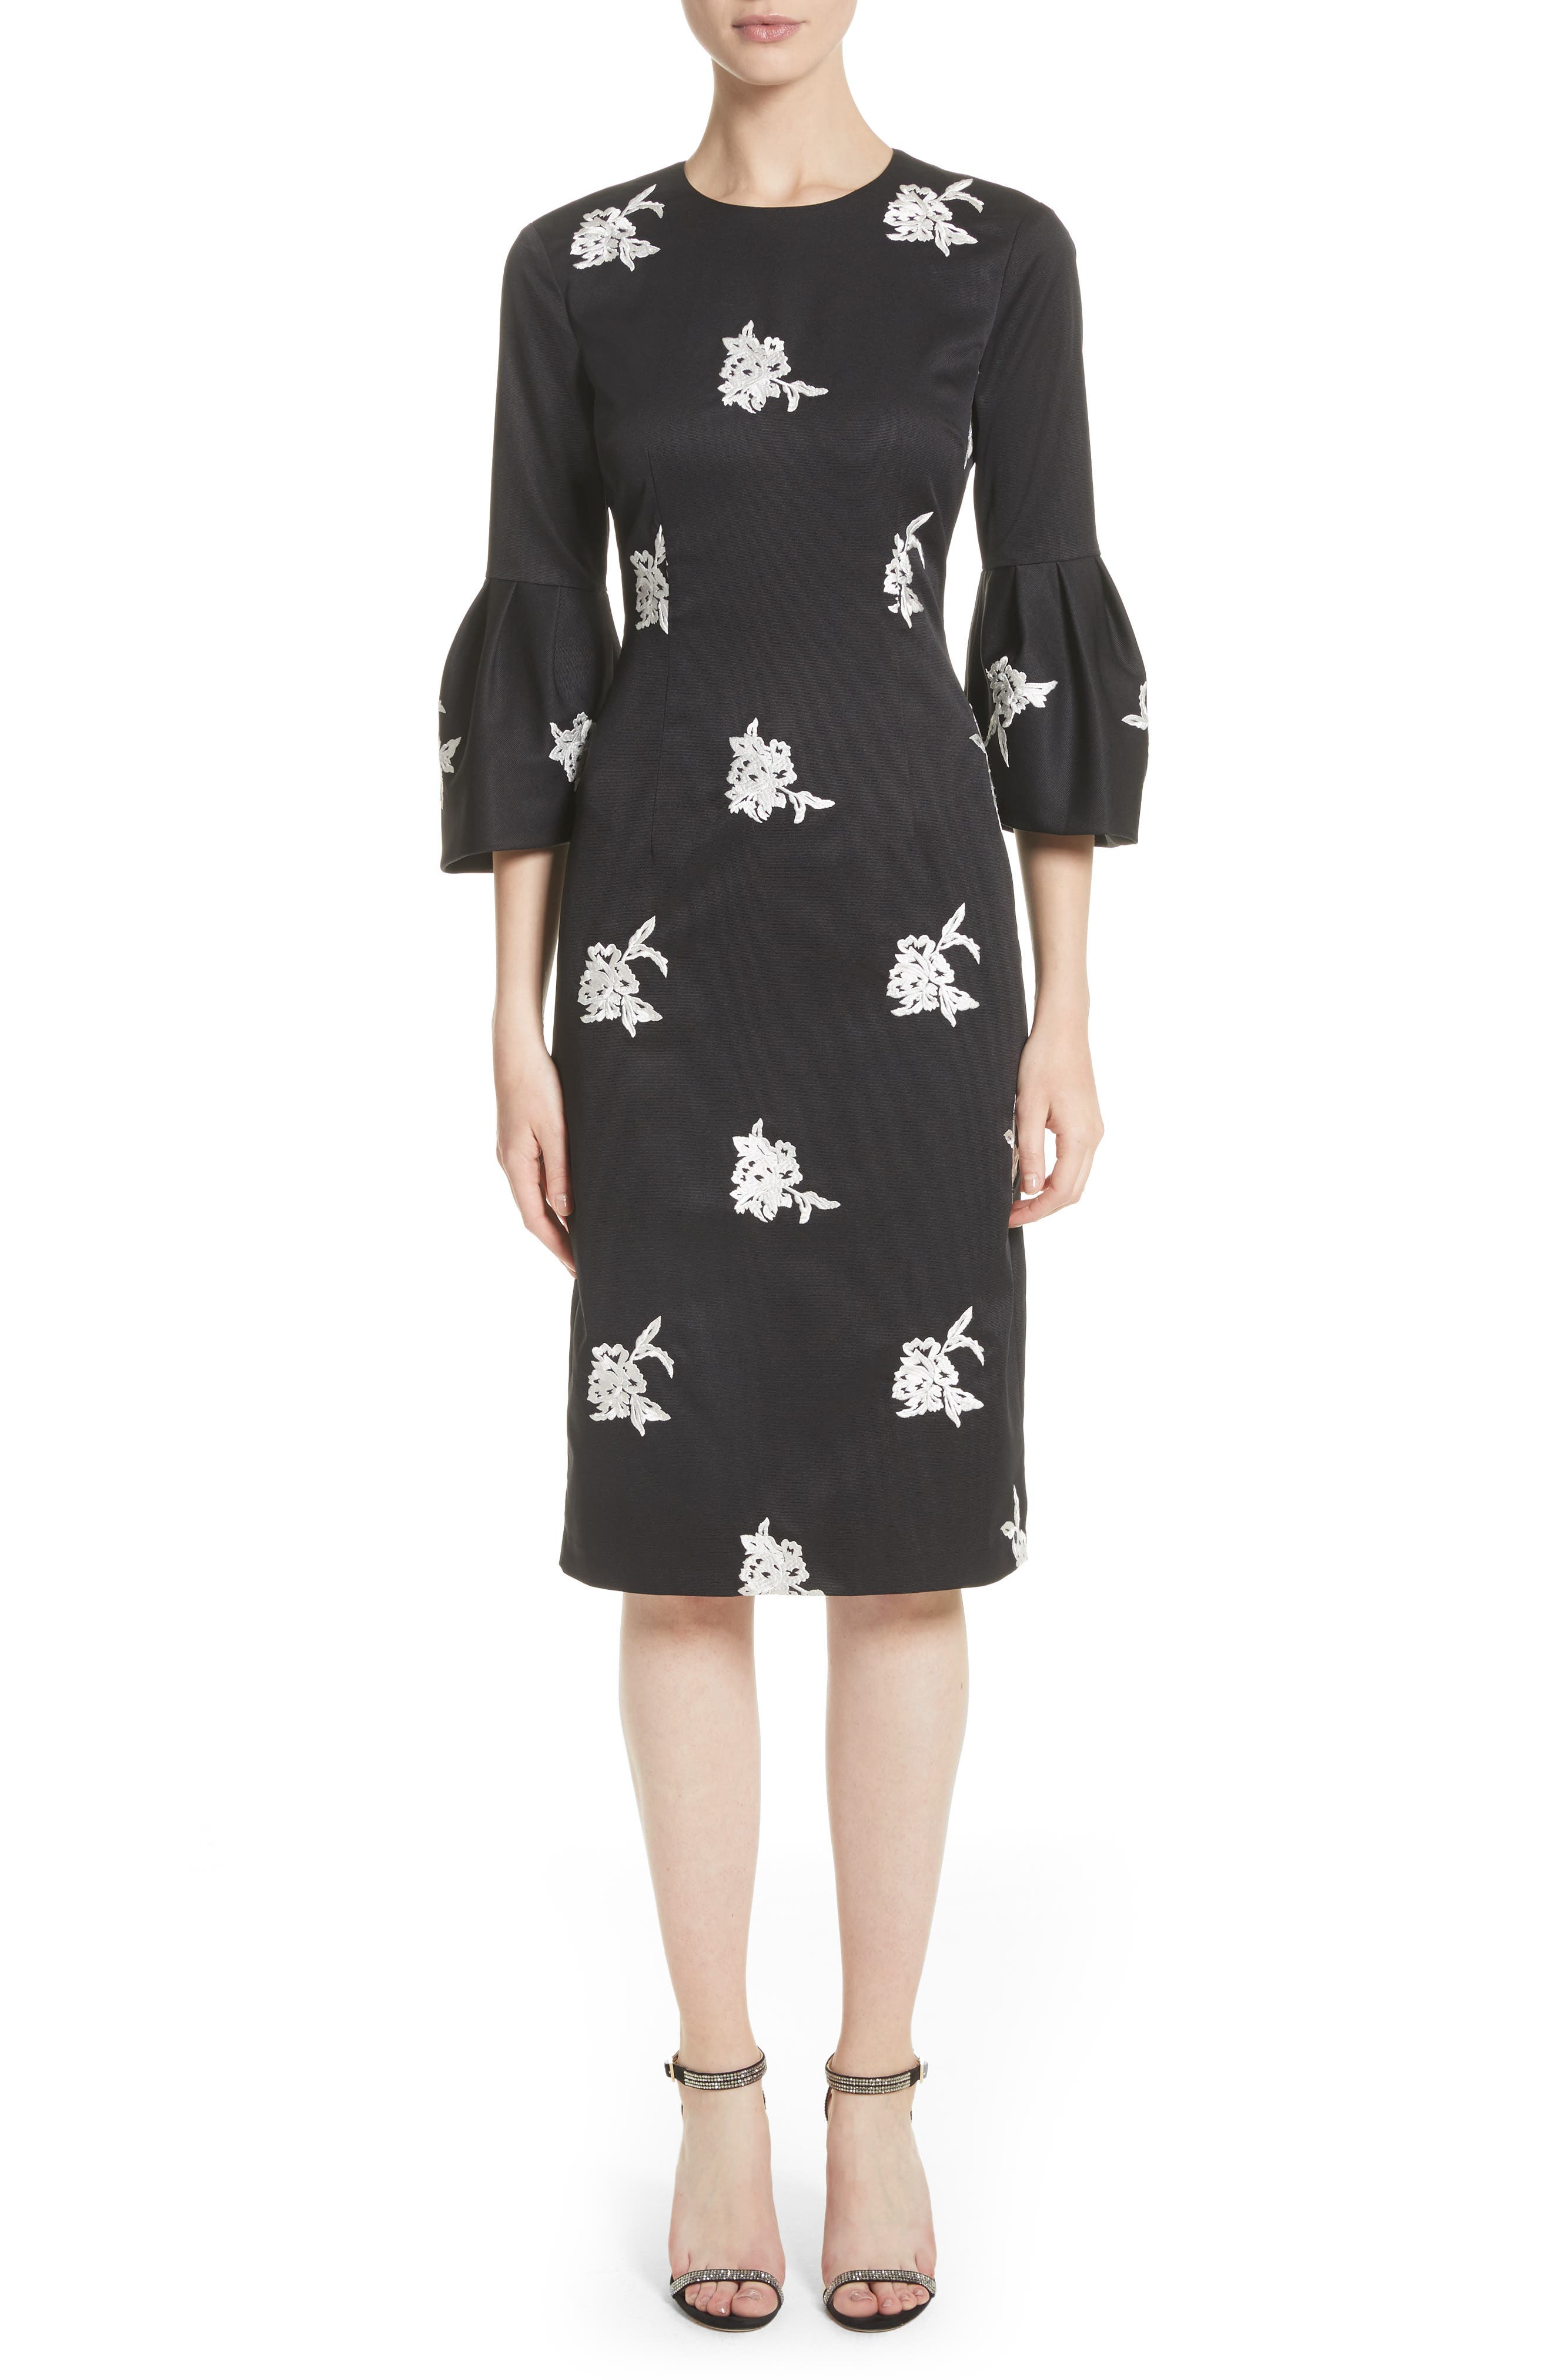 Alternate Image 1 Selected - Sachin & Babi Noir Embroidered Bell Sleeve Sheath Dress